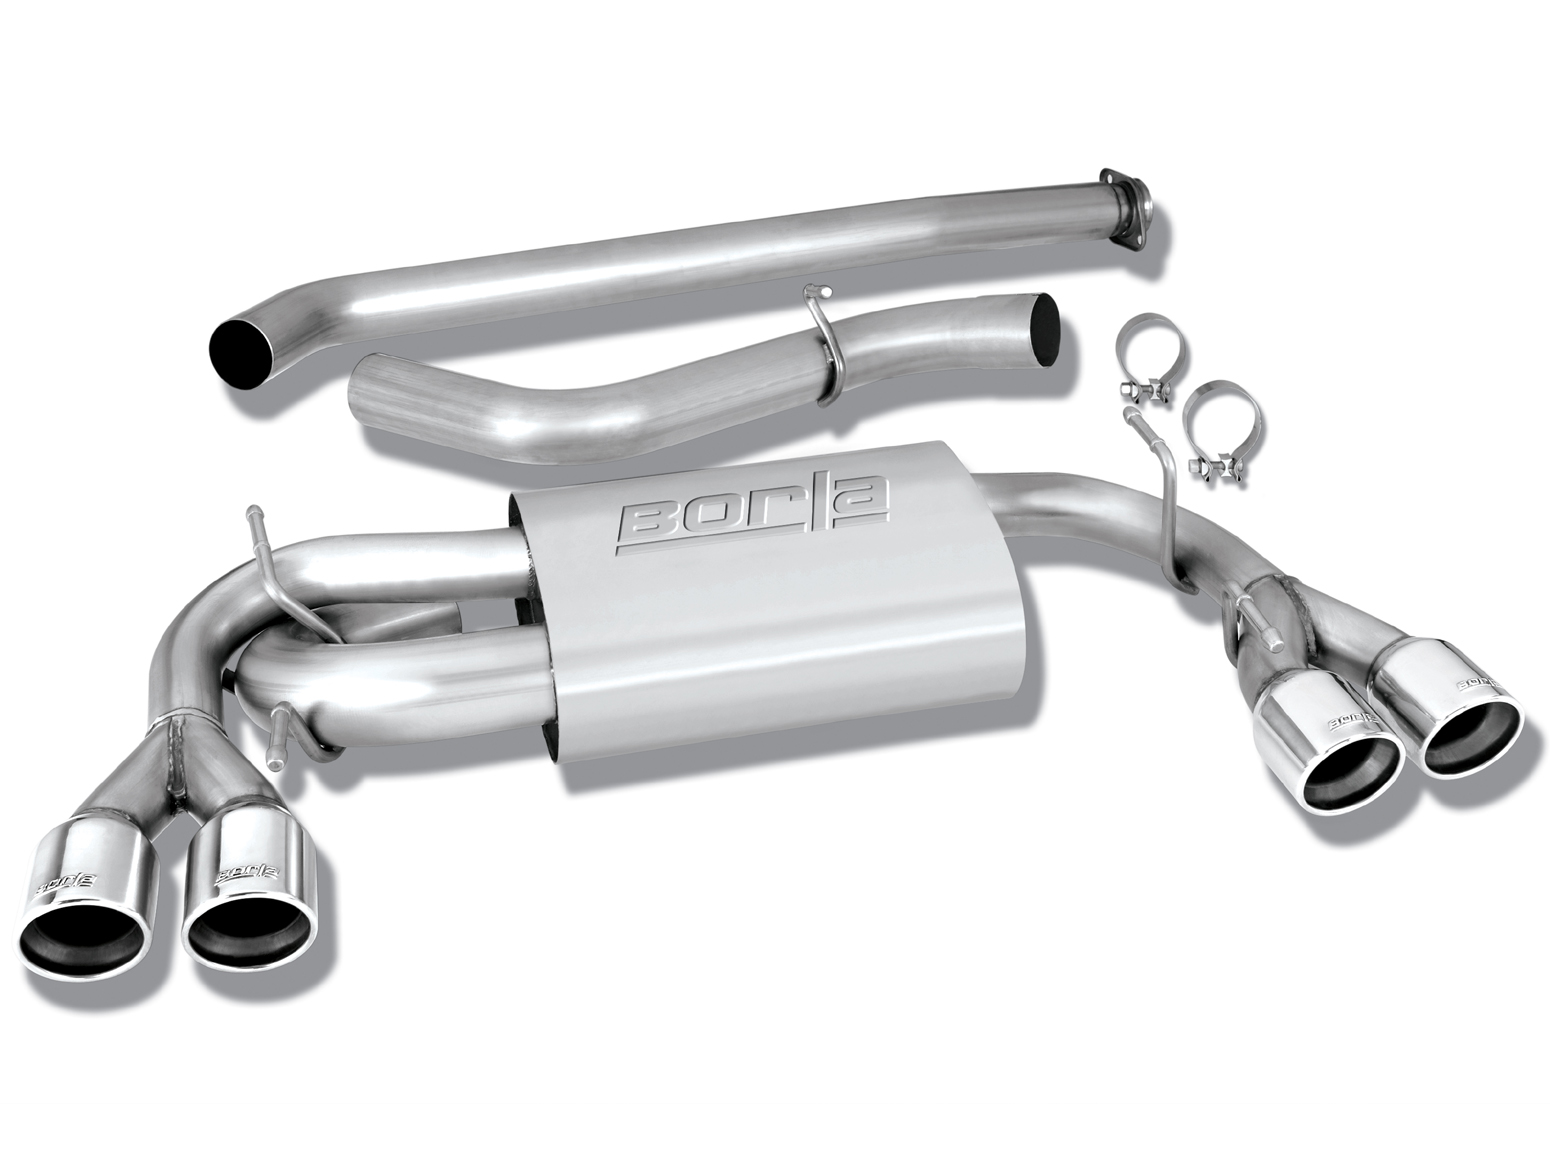 details about borla cat back exhaust s type part 140312 for impreza wrx wrx sti 2008 2014